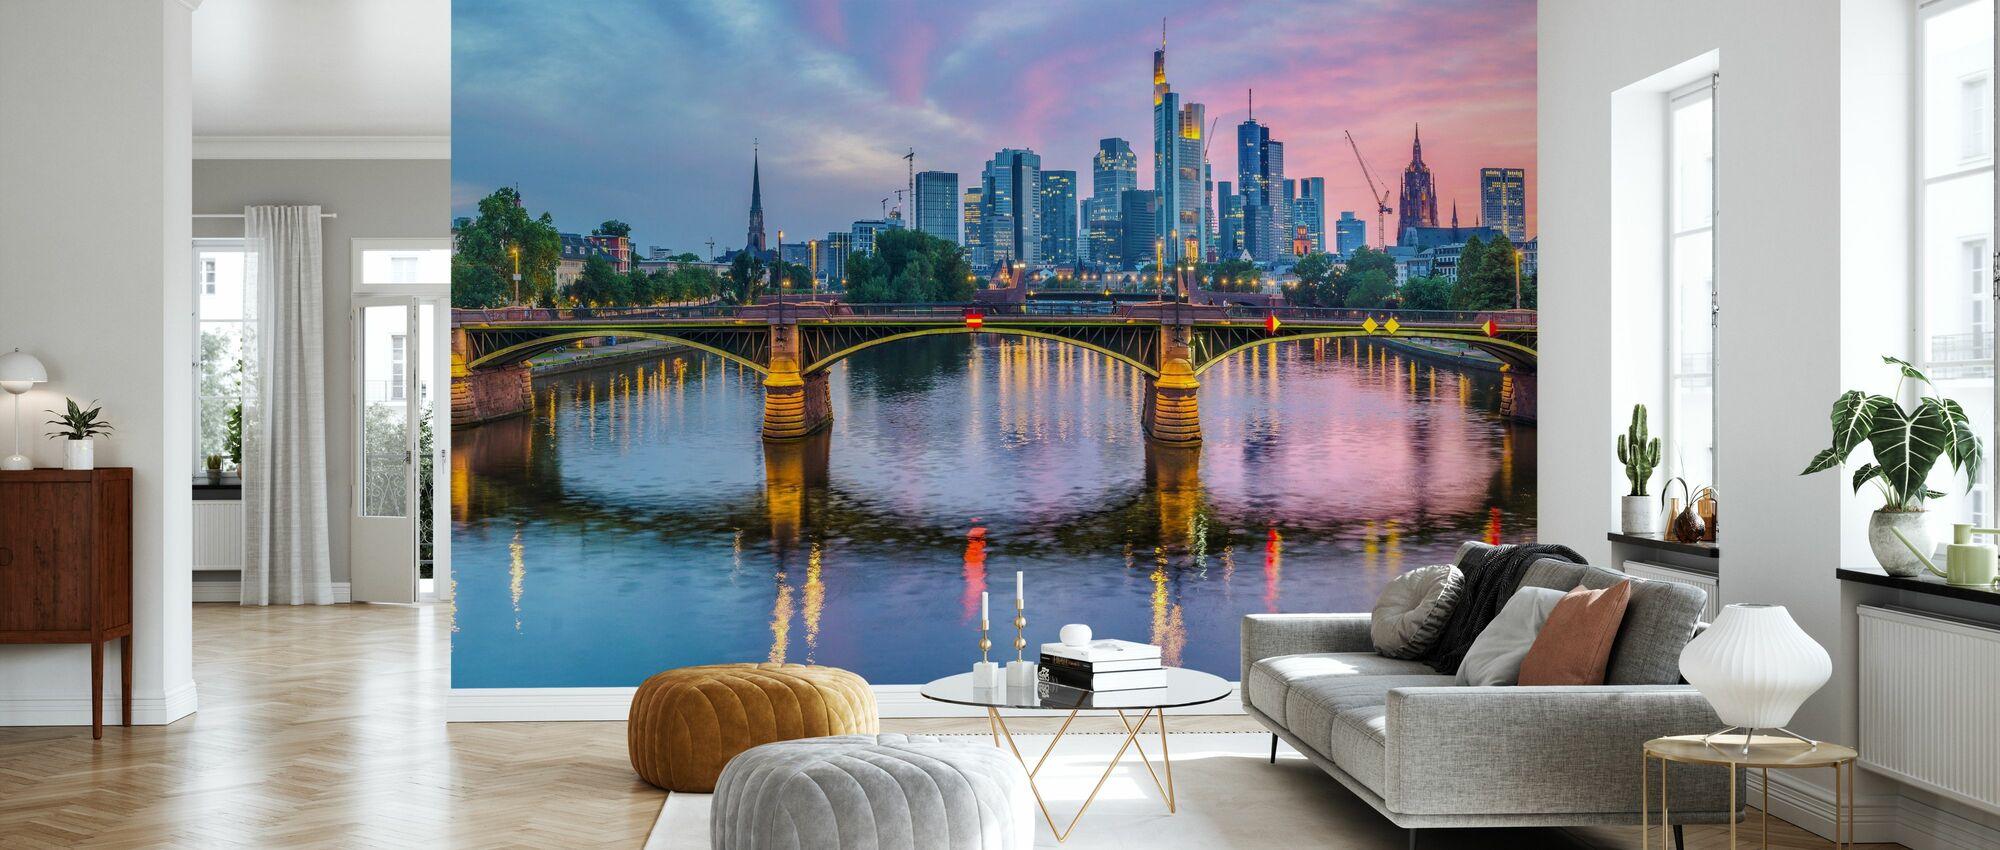 Skyline Frankfurt at Sunset - Wallpaper - Living Room